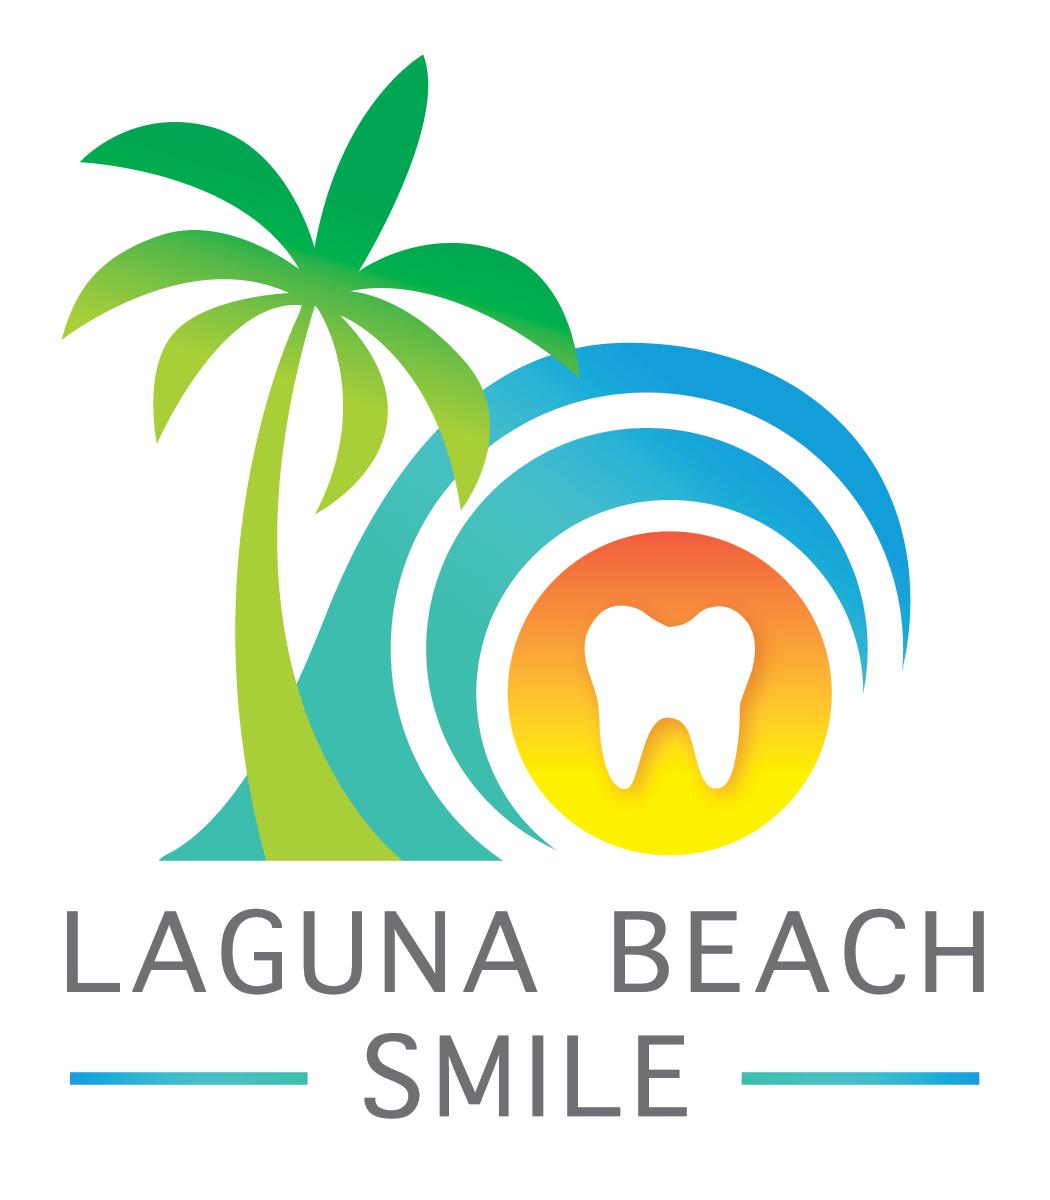 Laguna Beach Smile